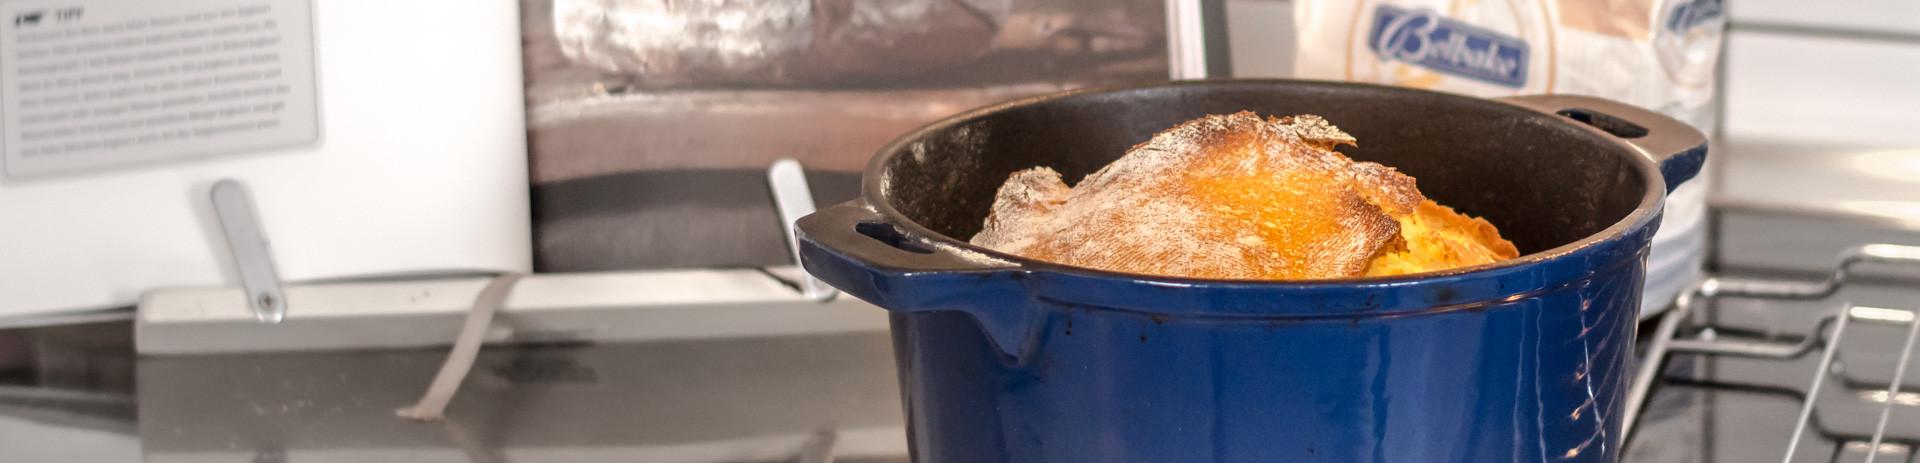 Gusseiserner Topf zum Brotbacken